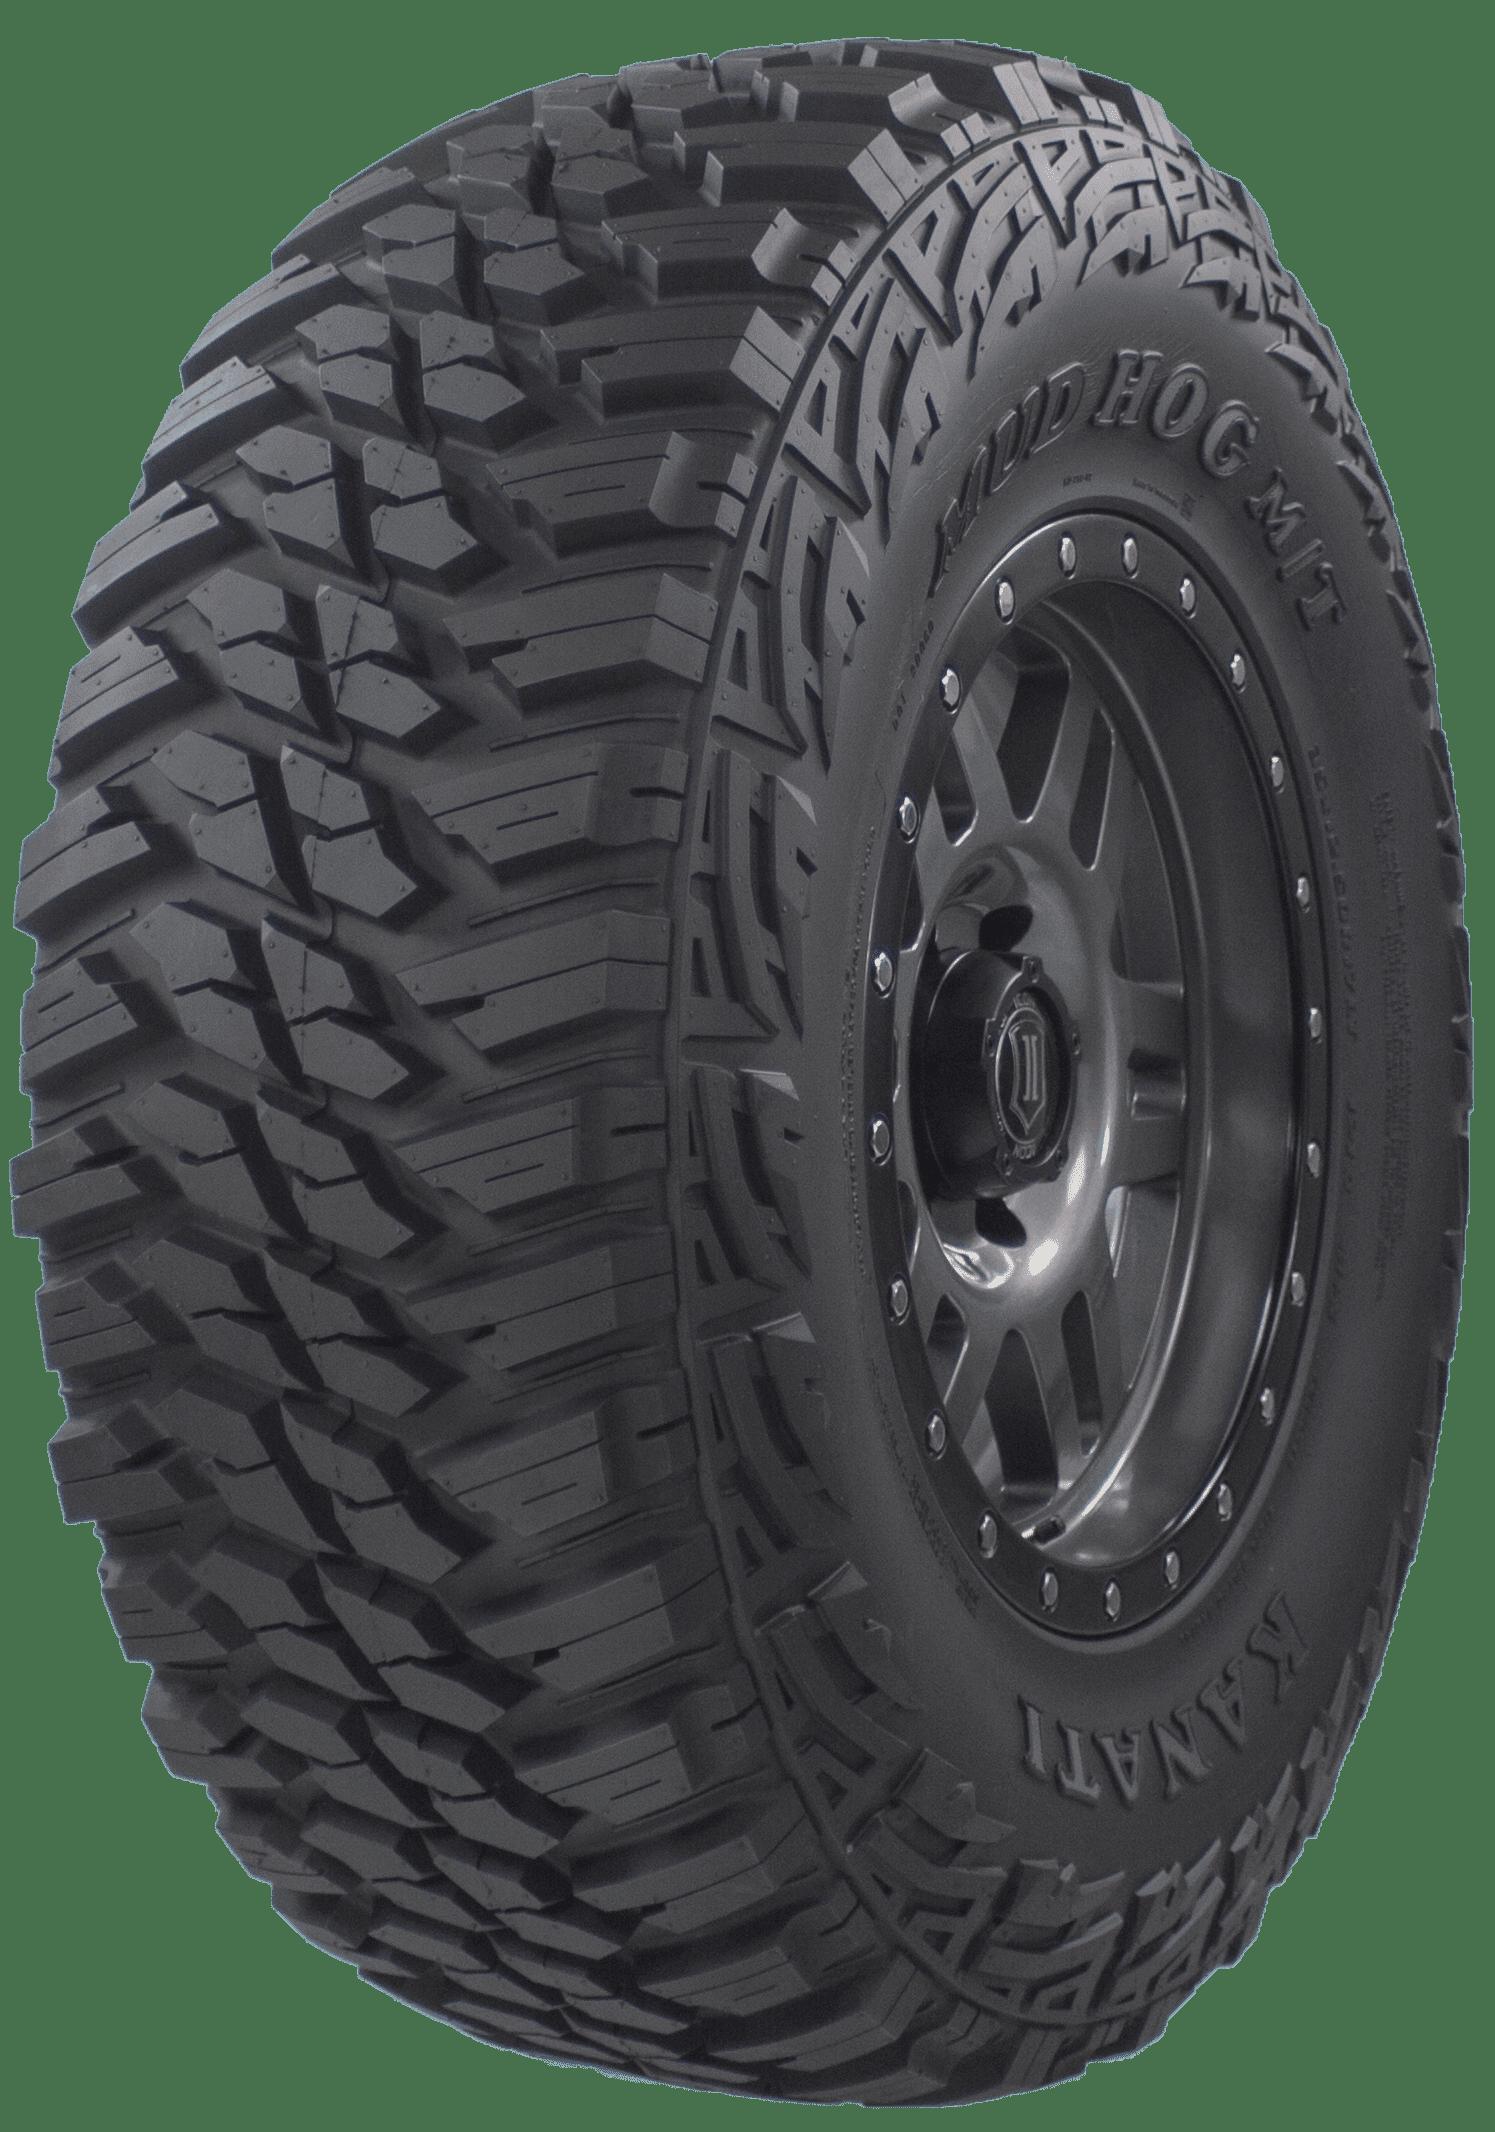 Trail Guide Terrain Radial LT Truck Tire-LT275//65R20 126R 10-ply